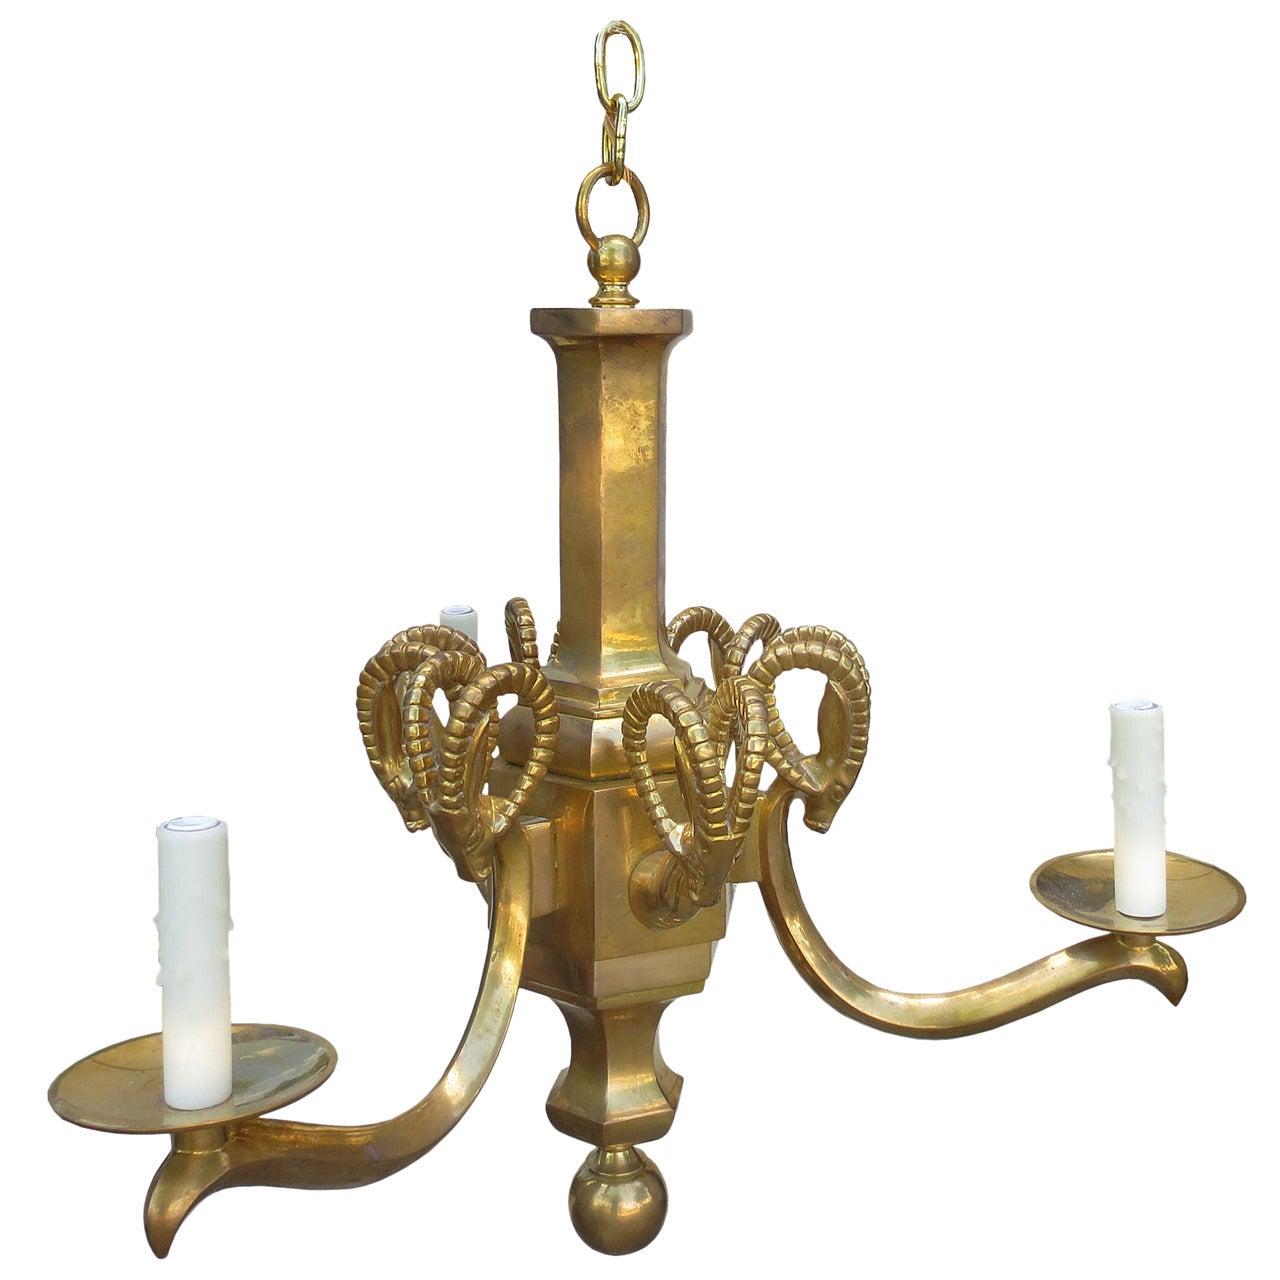 Mid-20th Century Champan Brass Three-Arm Chandelier with Ram's Heads